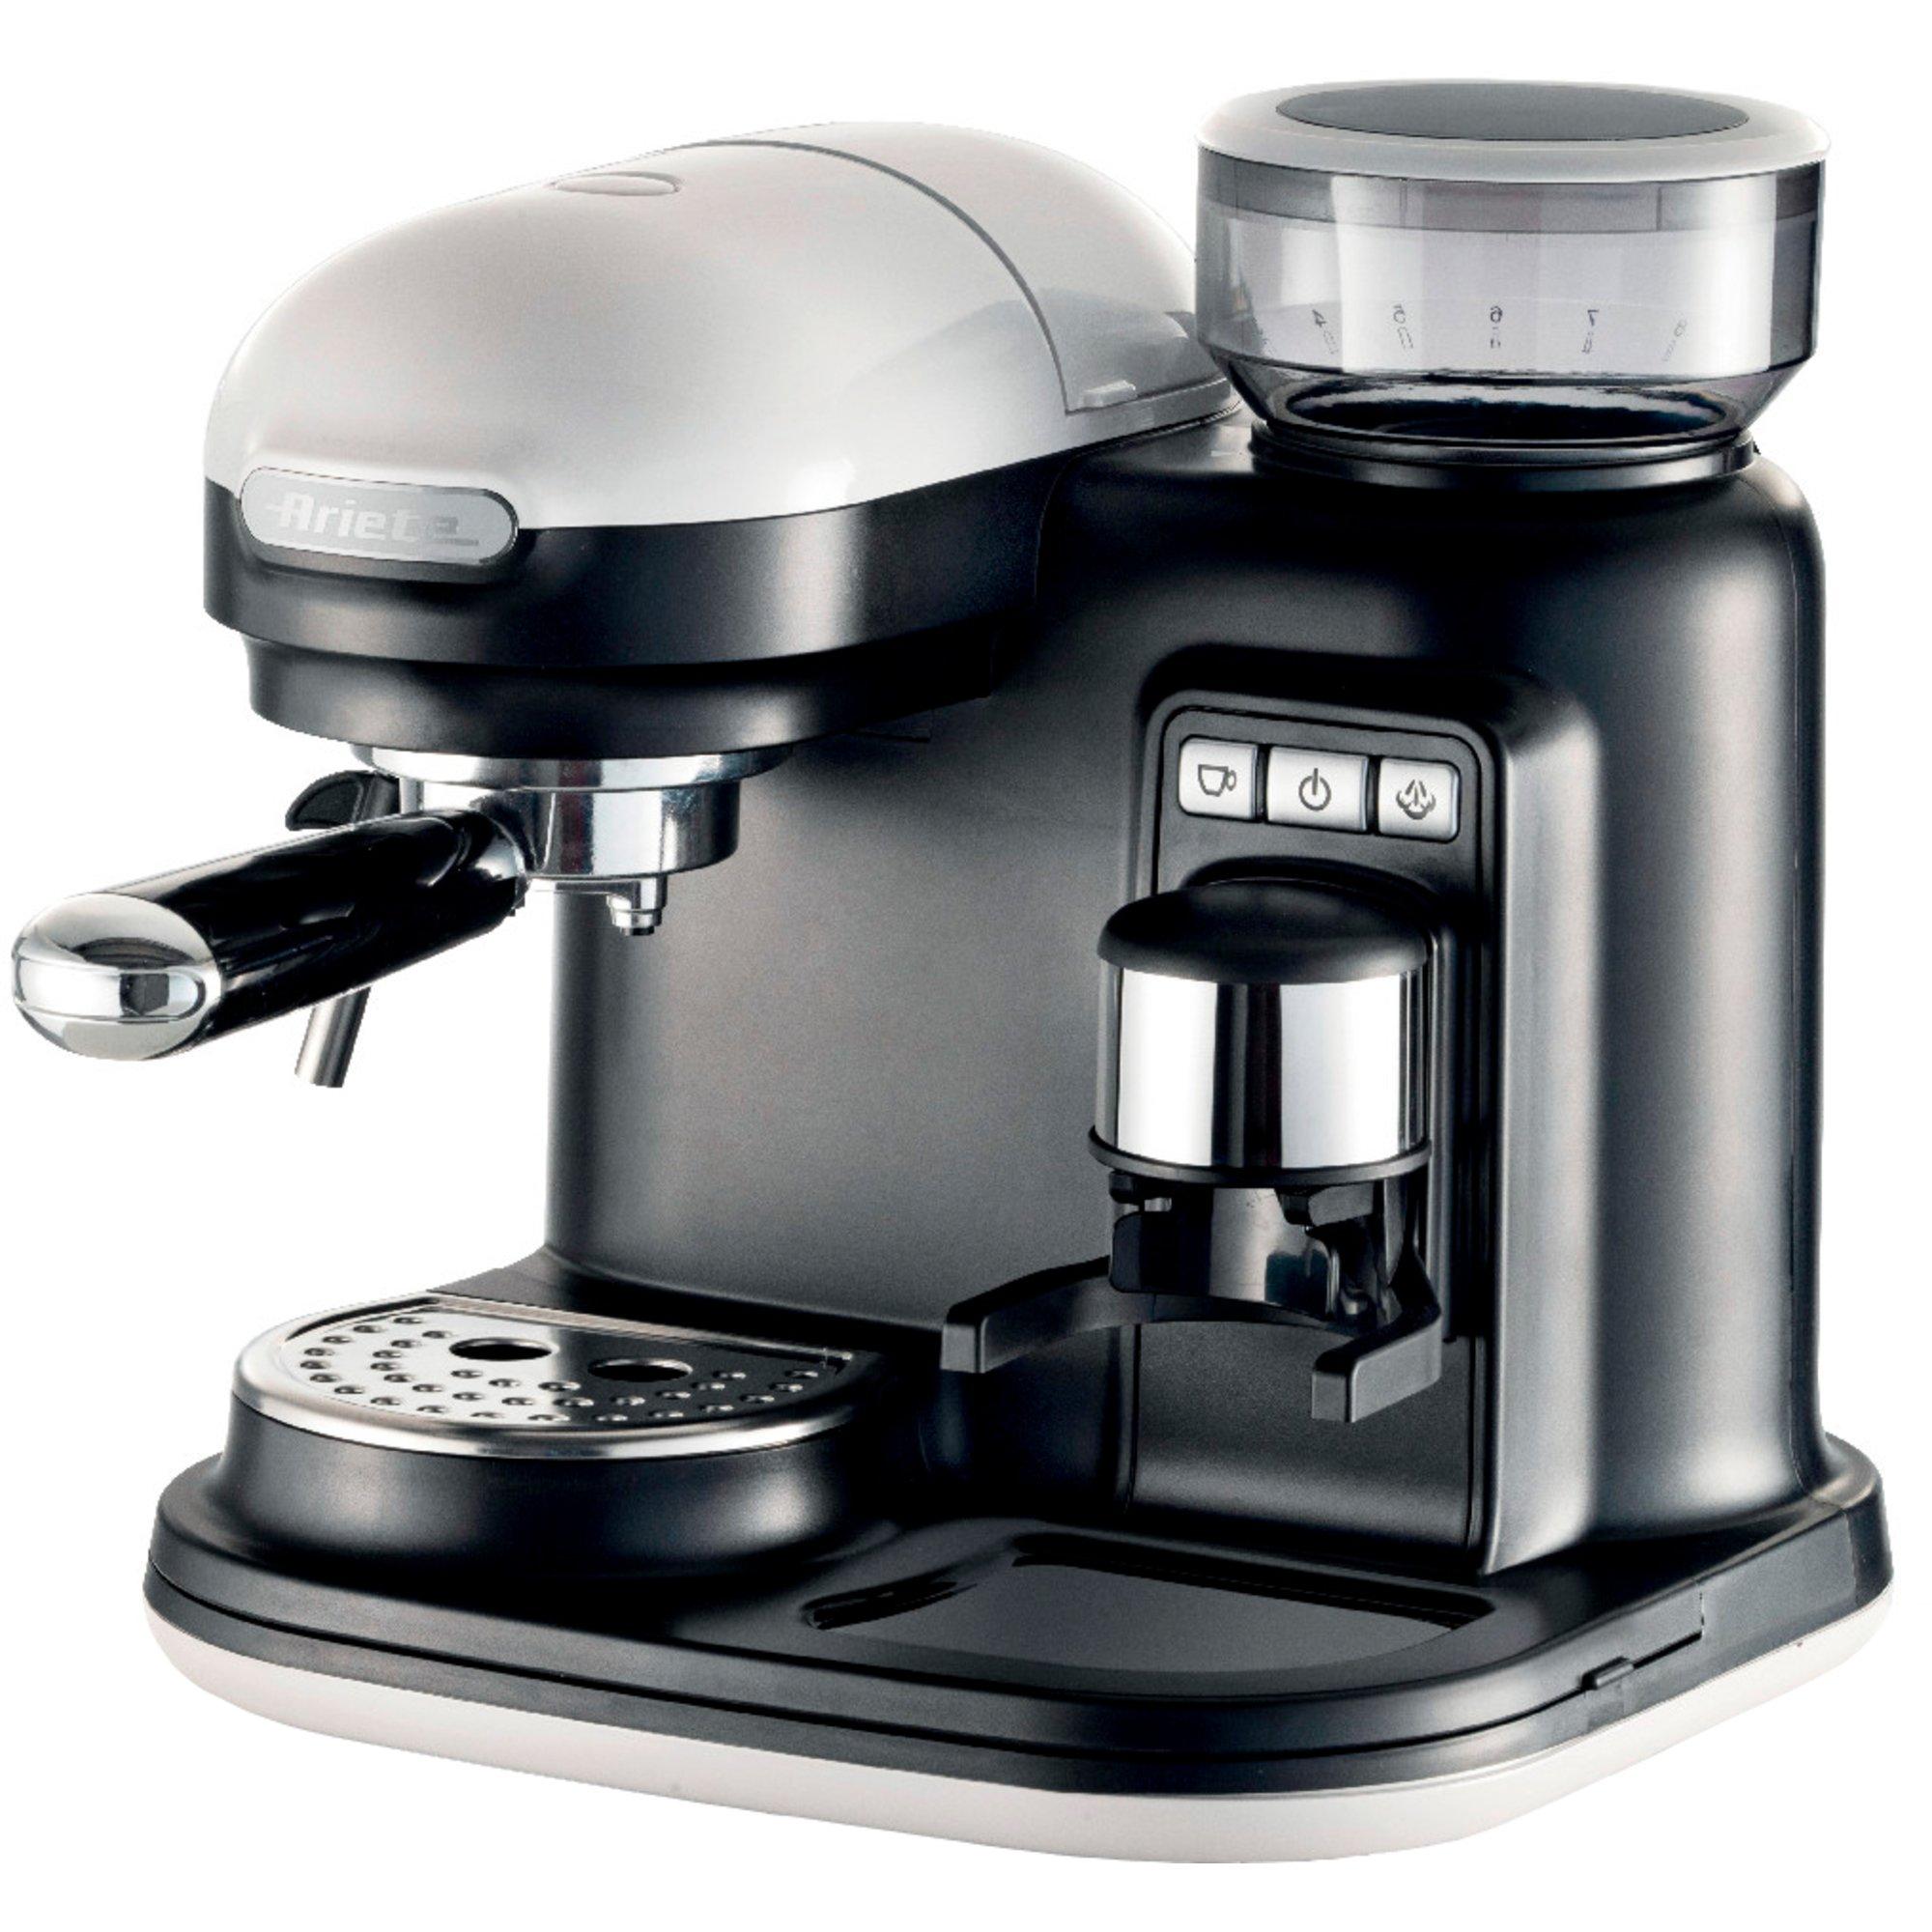 Ariete Moderna Espressomaskin med kaffekvarn vit